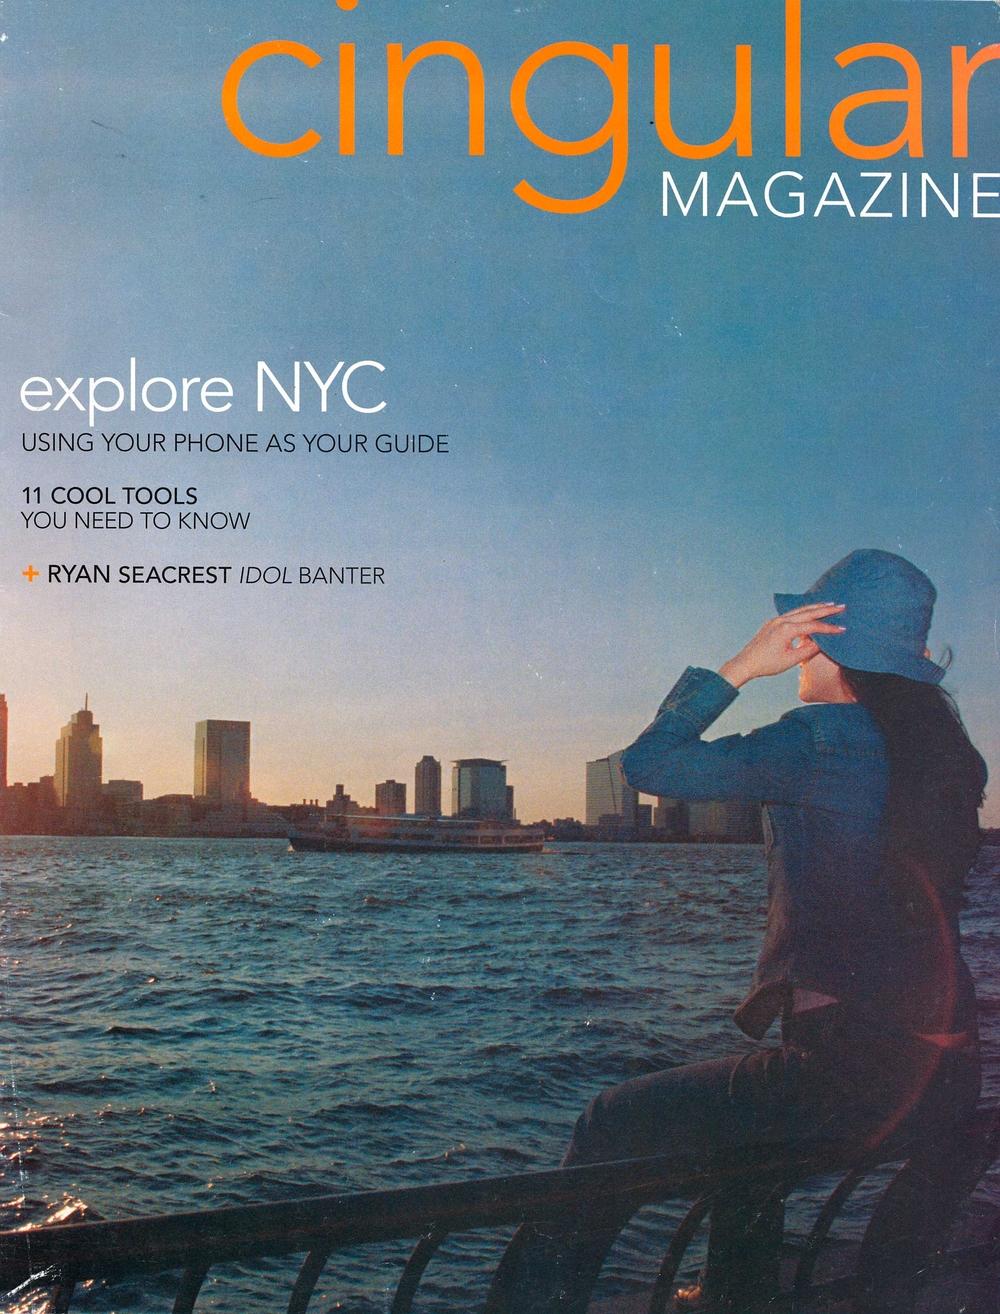 CingularMag_Cover.jpg